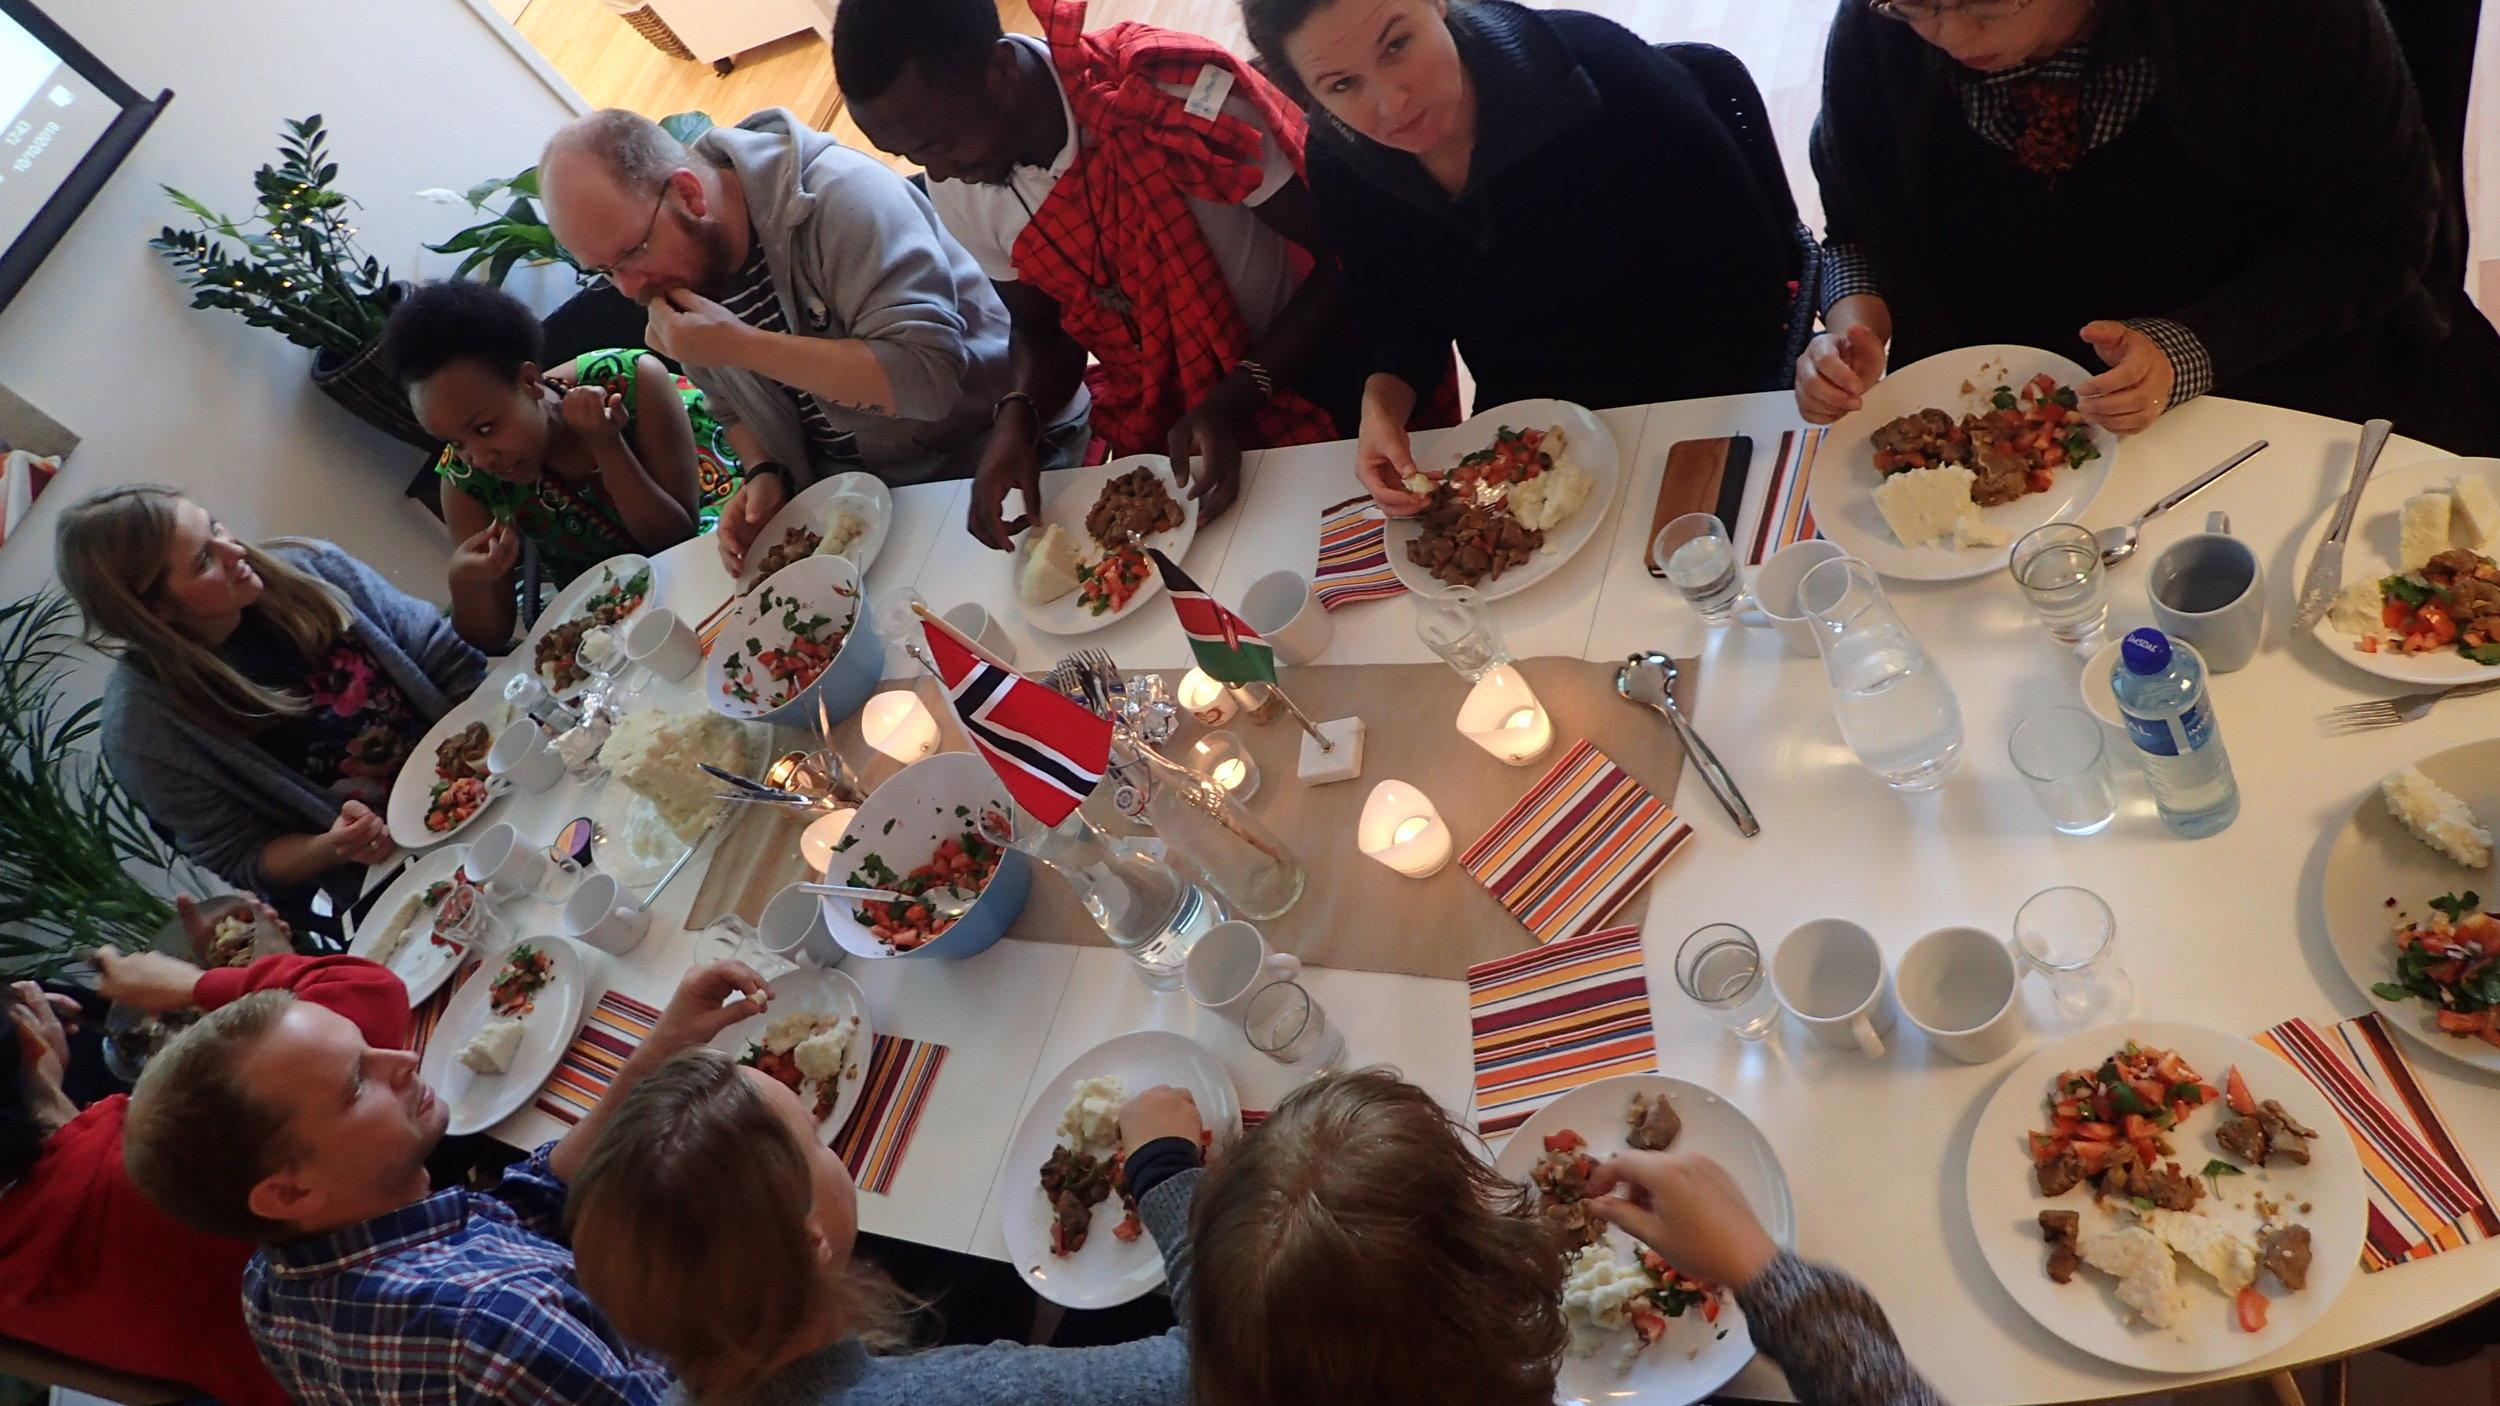 Kenyan lunch at Red Cross Akershus District office